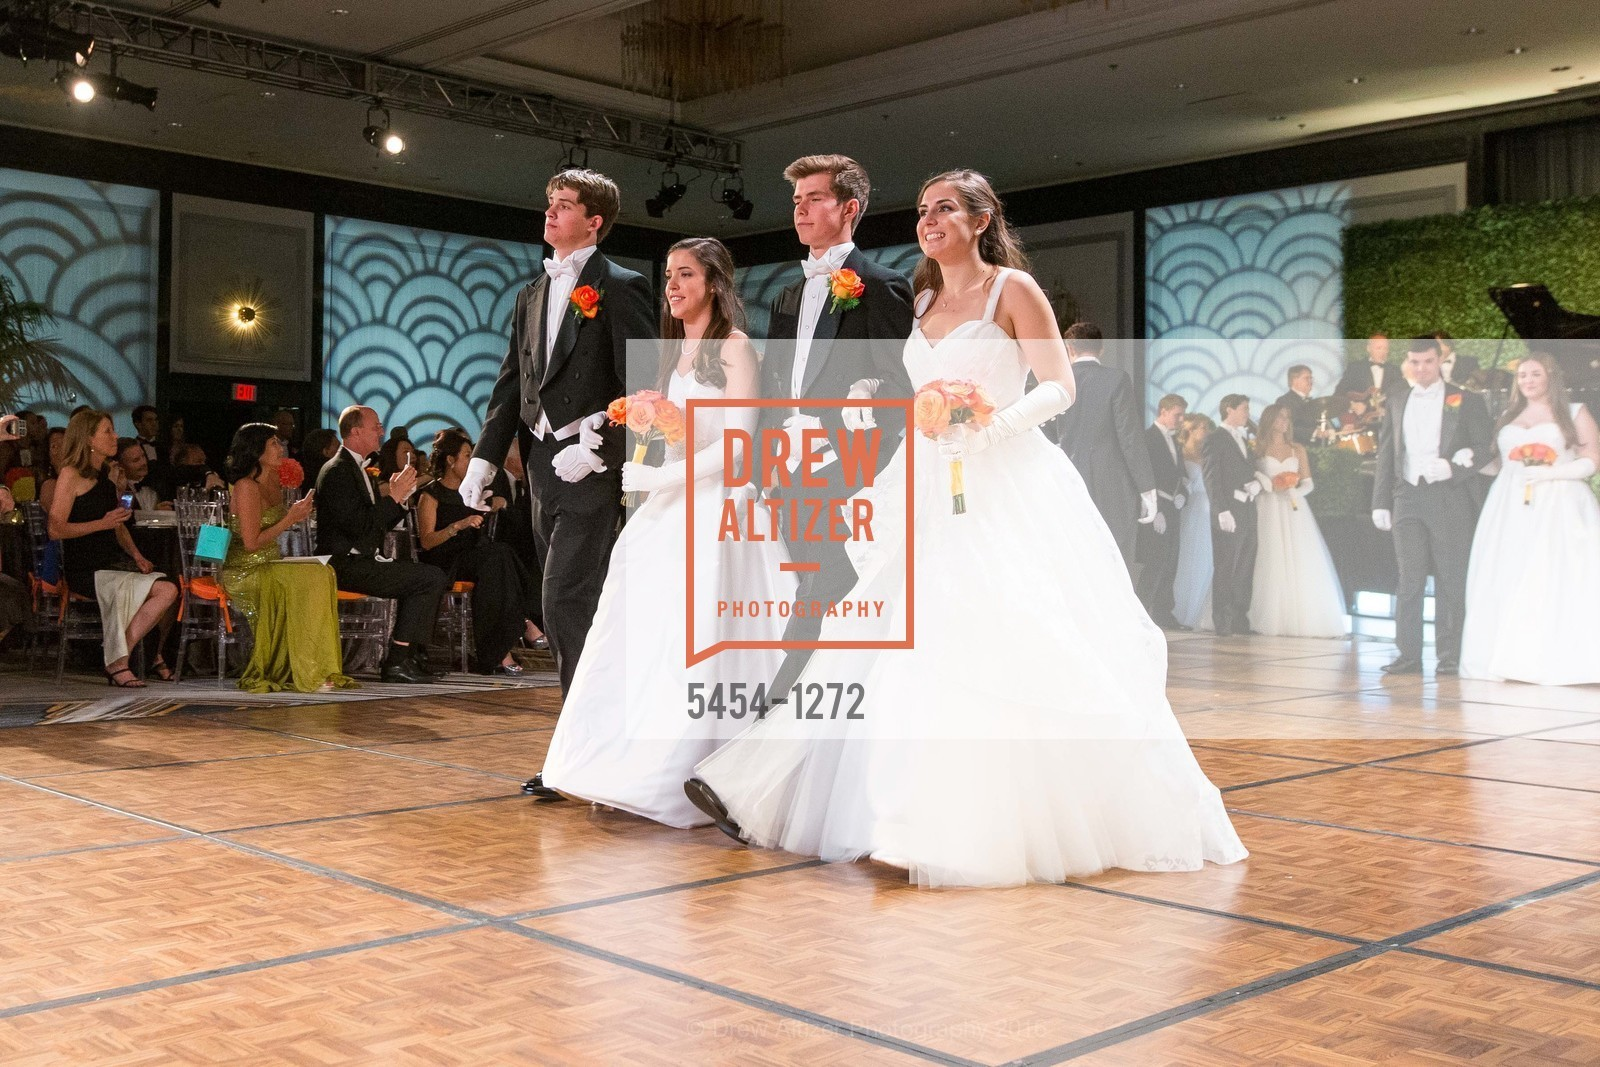 Max Rieser, Alanna DeMuro, Bennett Canady, Caroline Coffey, Photo #5454-1272